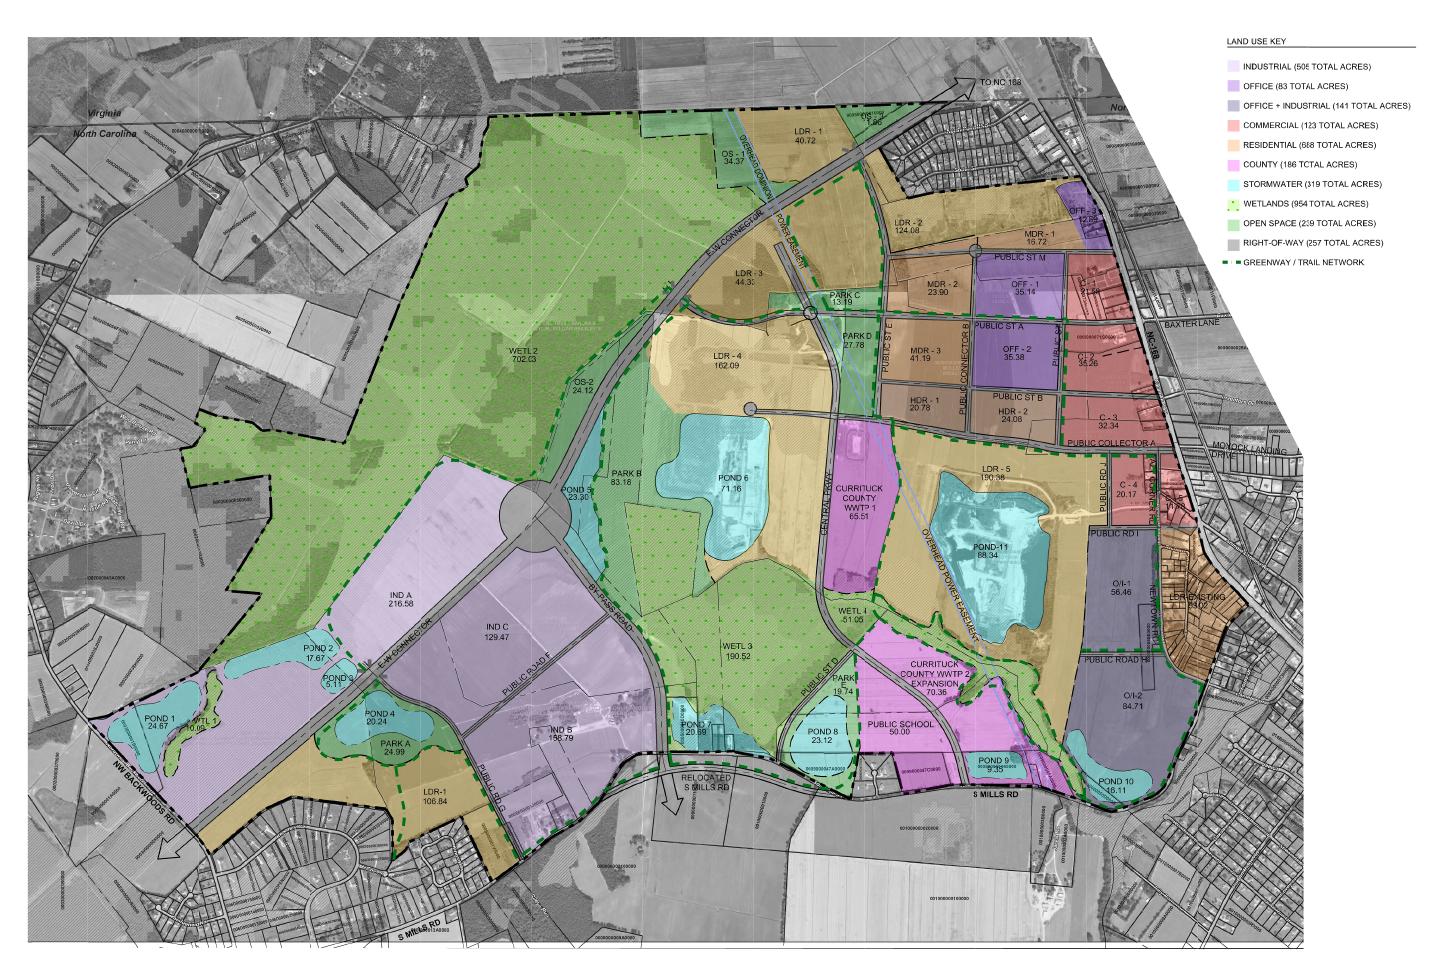 Currituck Station Master Land Use Plan - Image